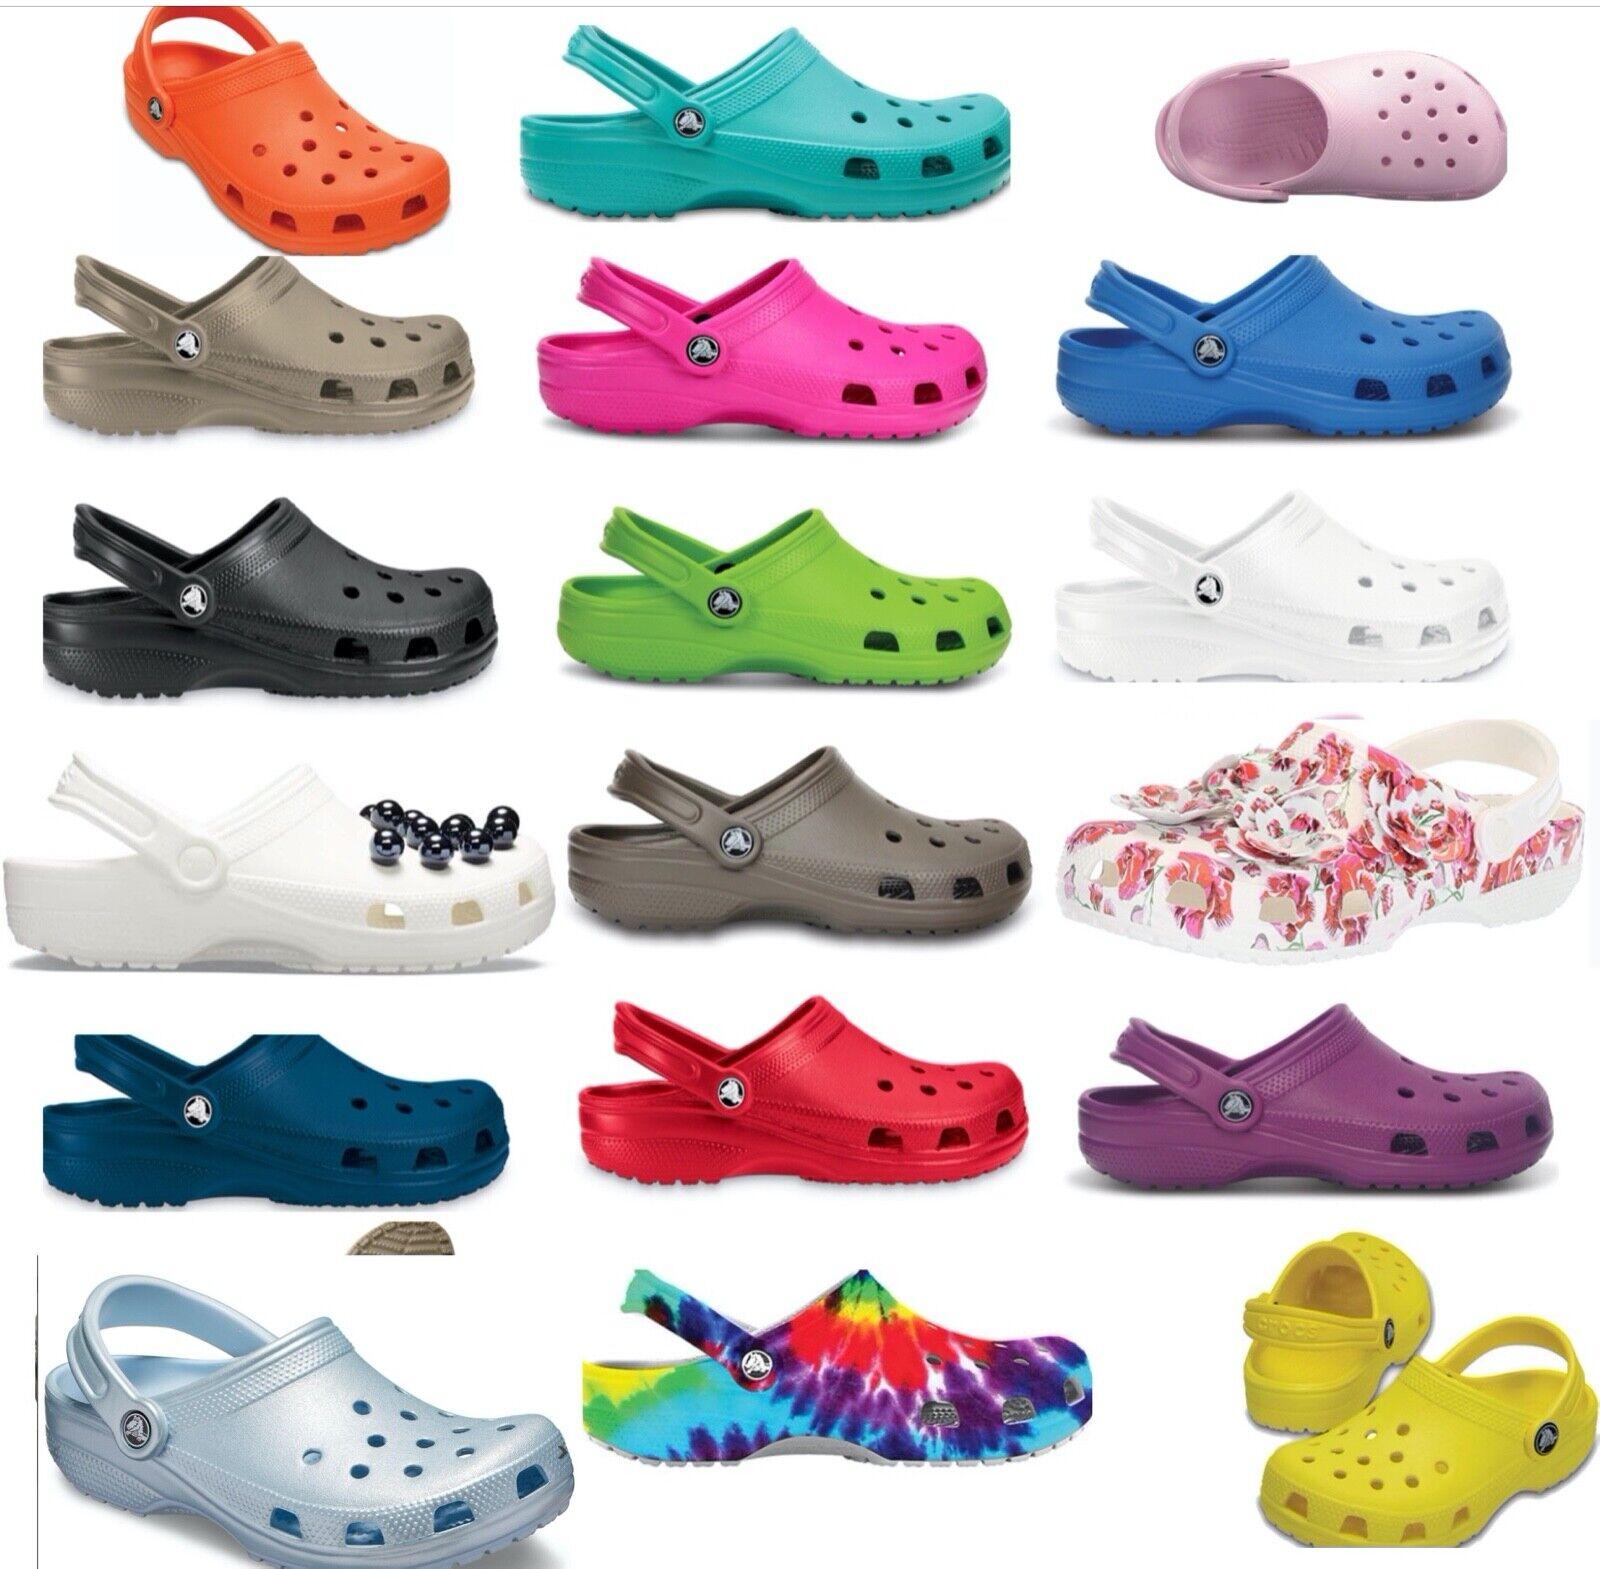 original classic clogs shoes sandals vegan sizes